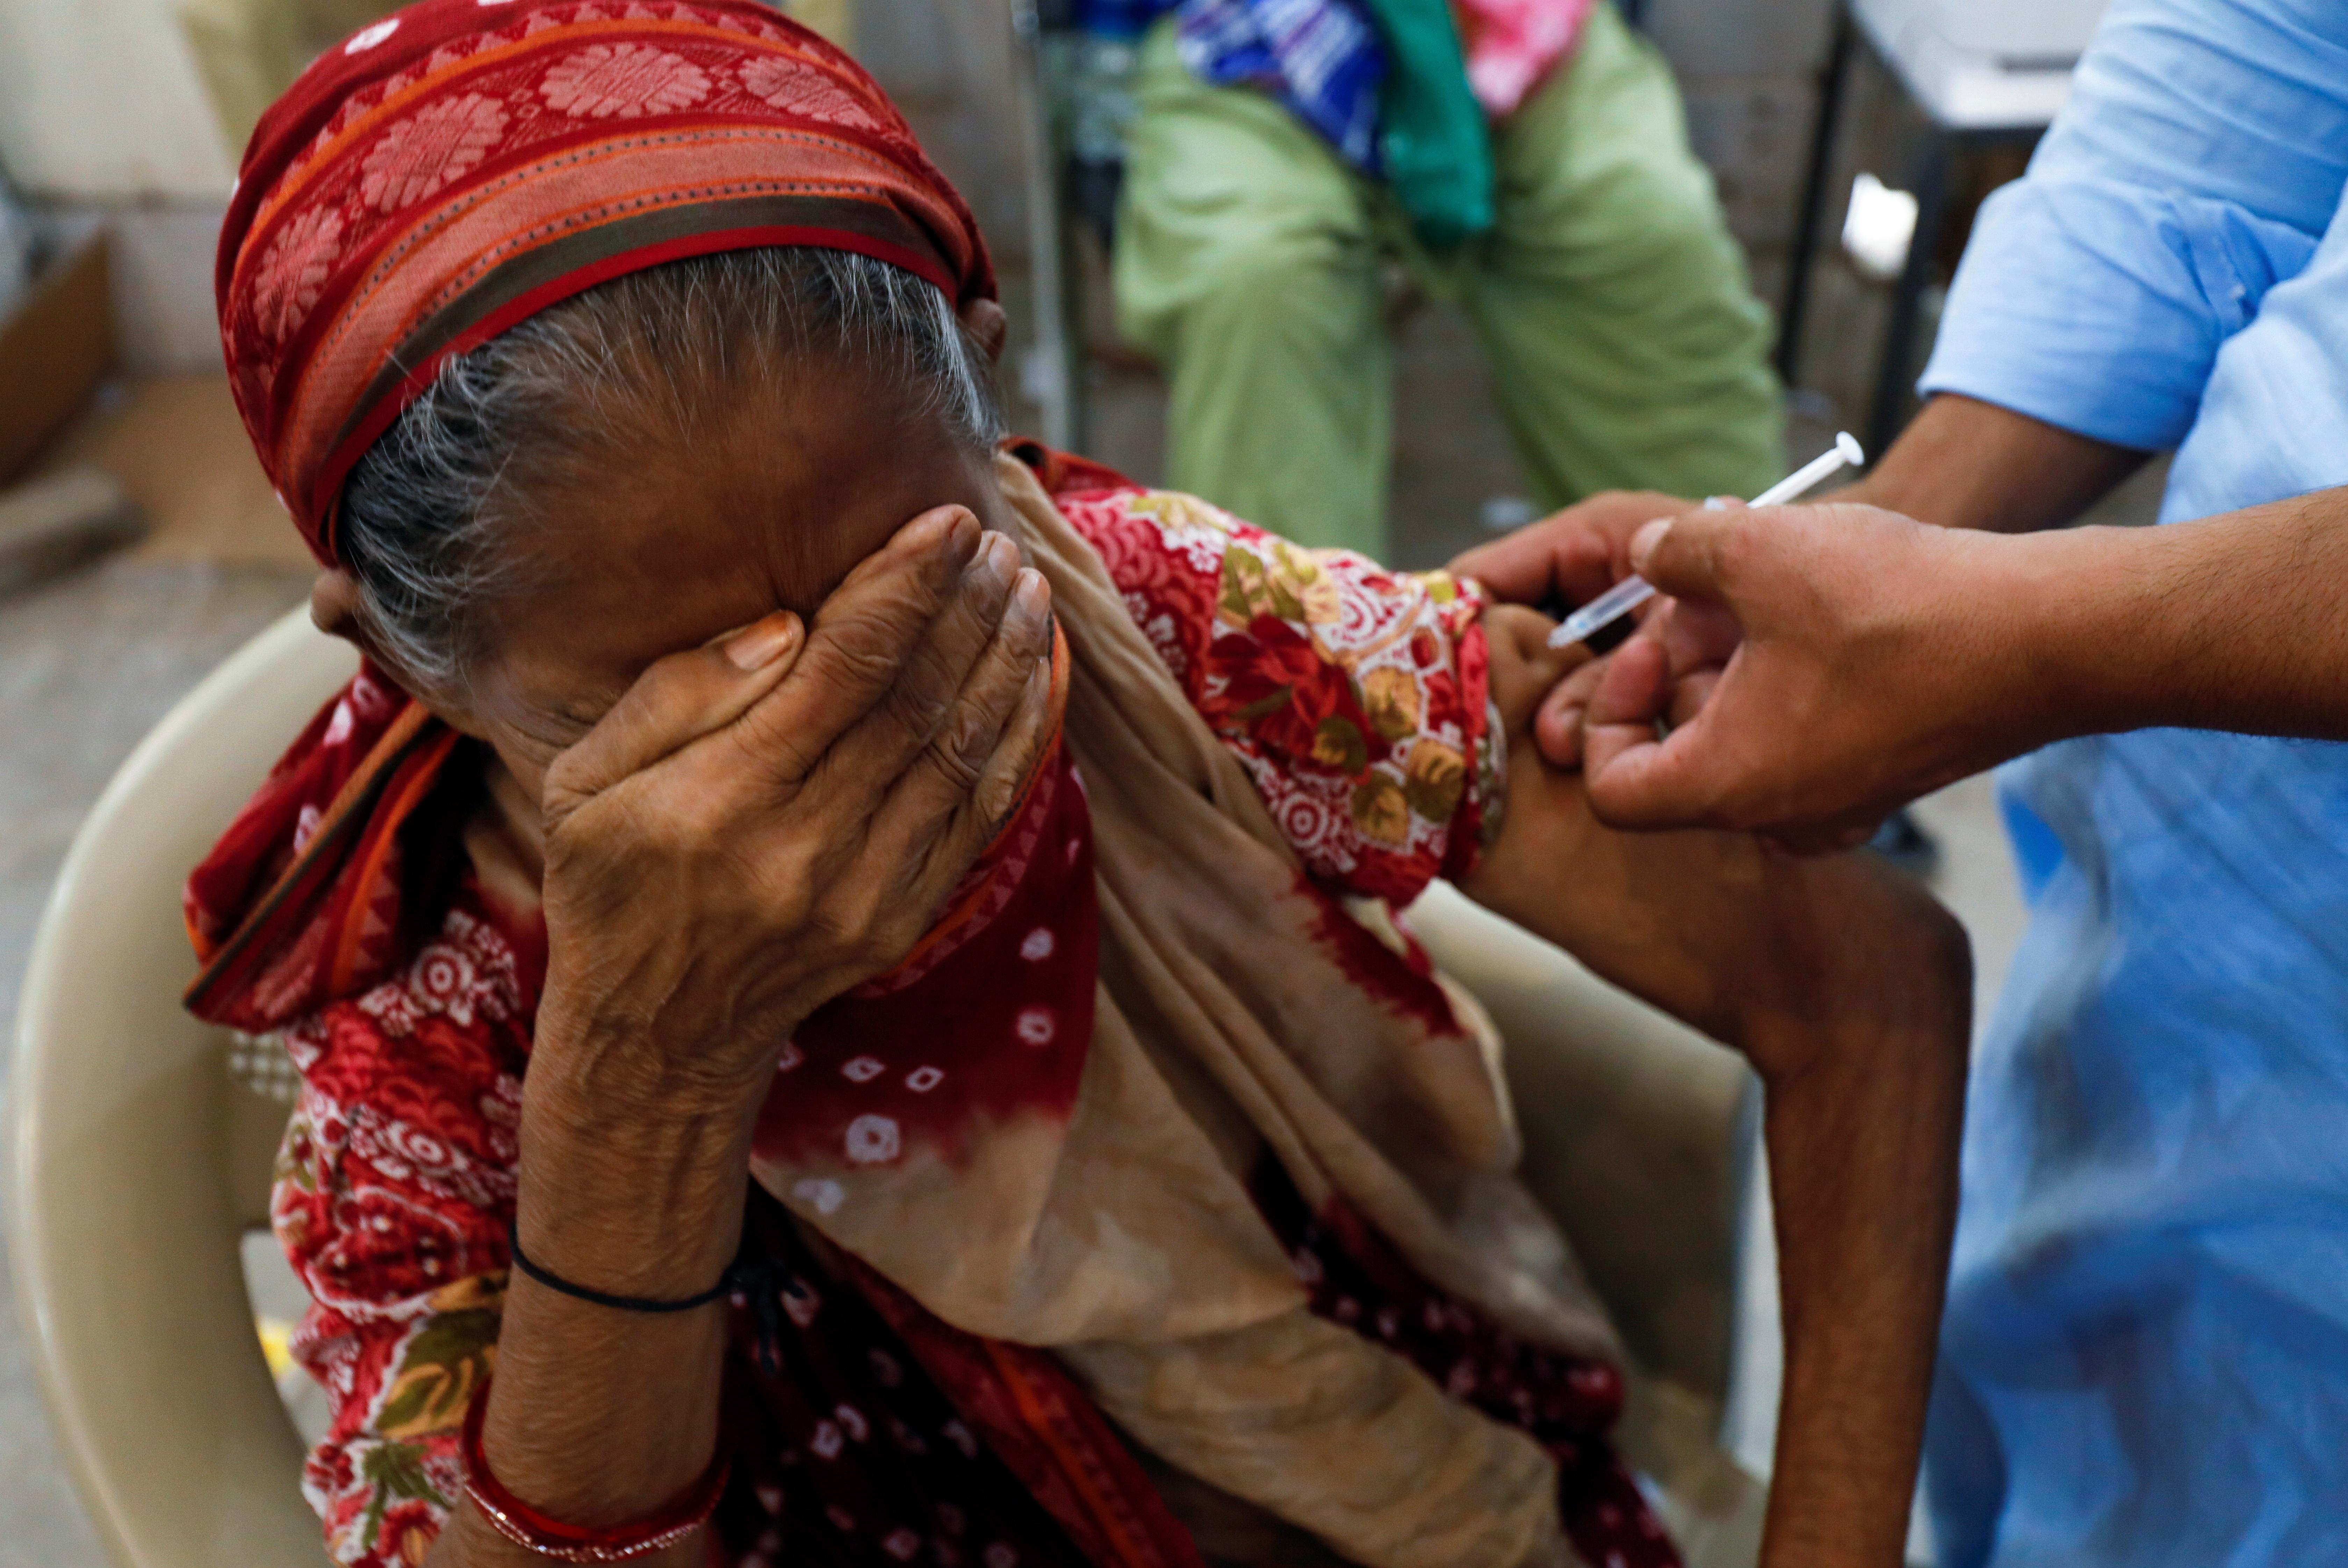 Basanti, 71, reacts as she receives a dose of the coronavirus disease (COVID-19) vaccine at a vaccination center in Karachi, Pakistan June 9, 2021. REUTERS/Akhtar Soomro